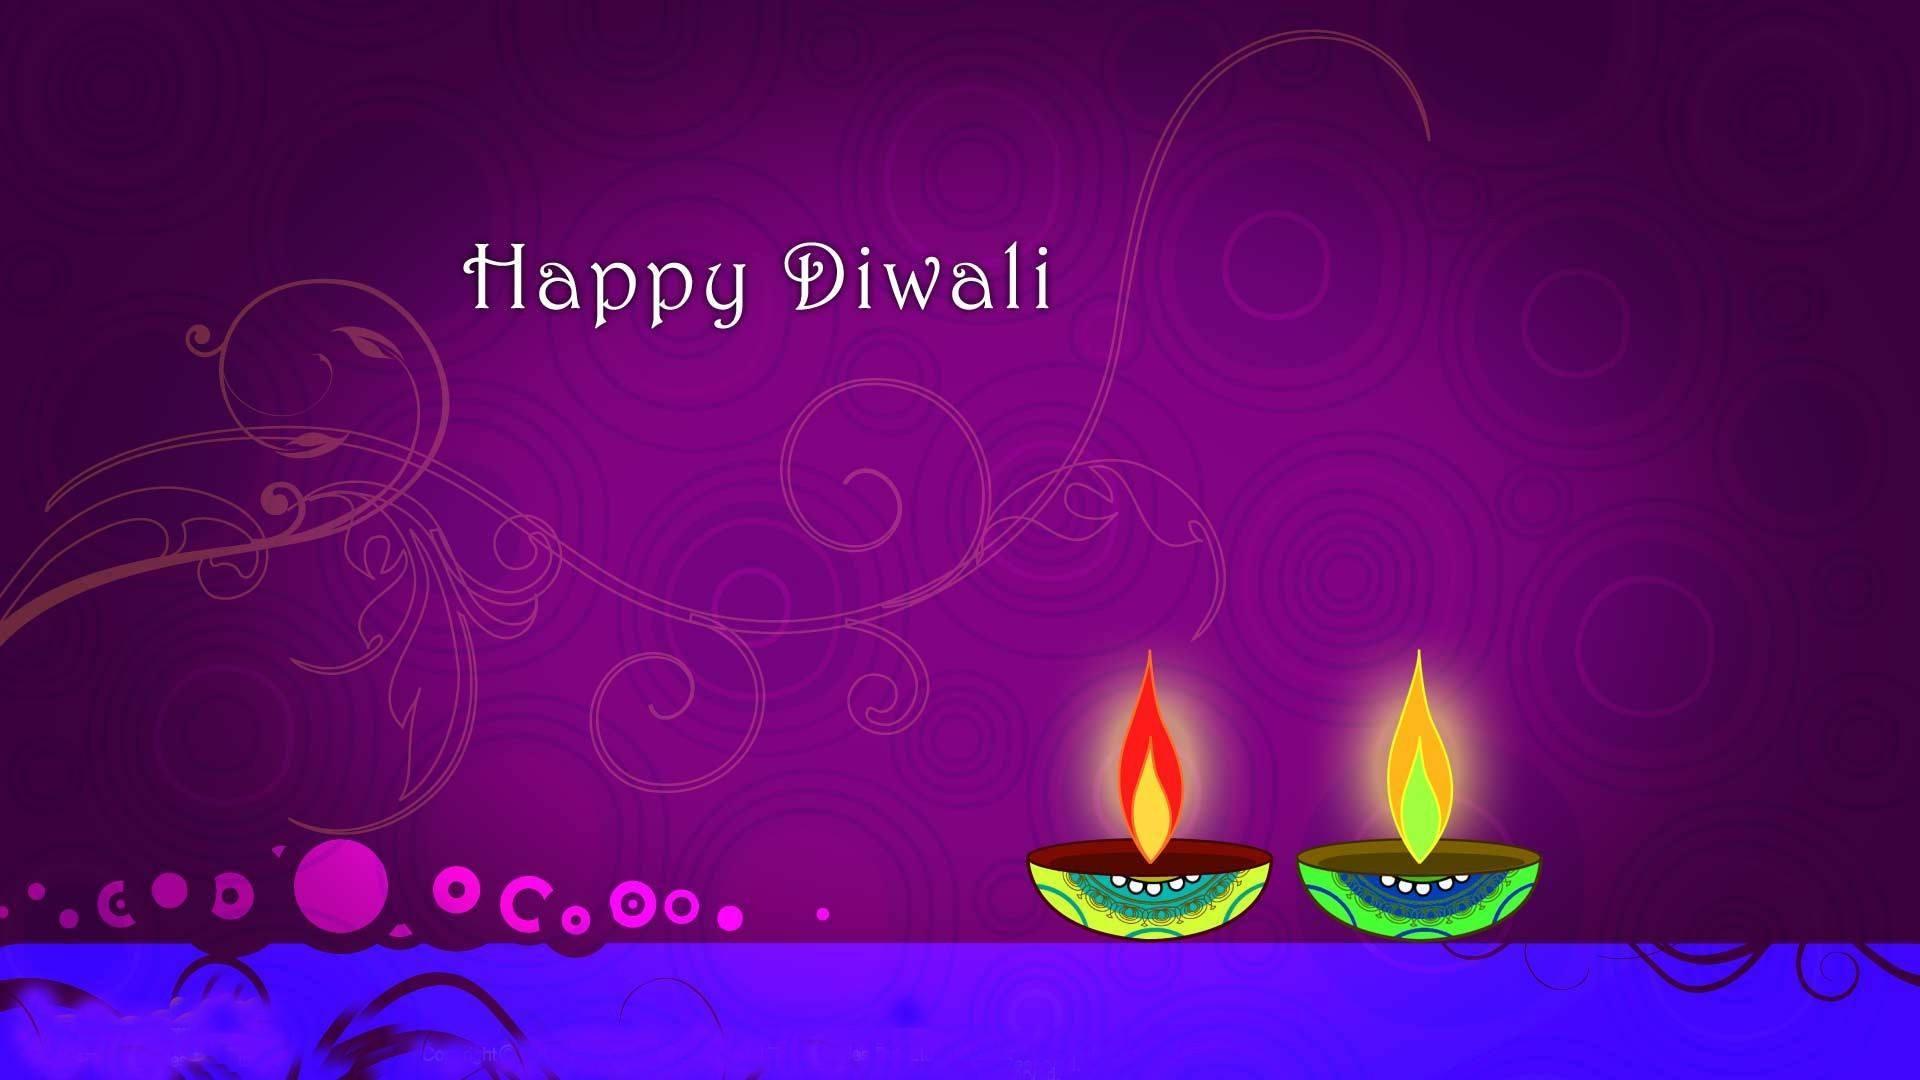 Happy Diwali Images 2017 Diwali Wallpapers Hd Free Deepawali Images